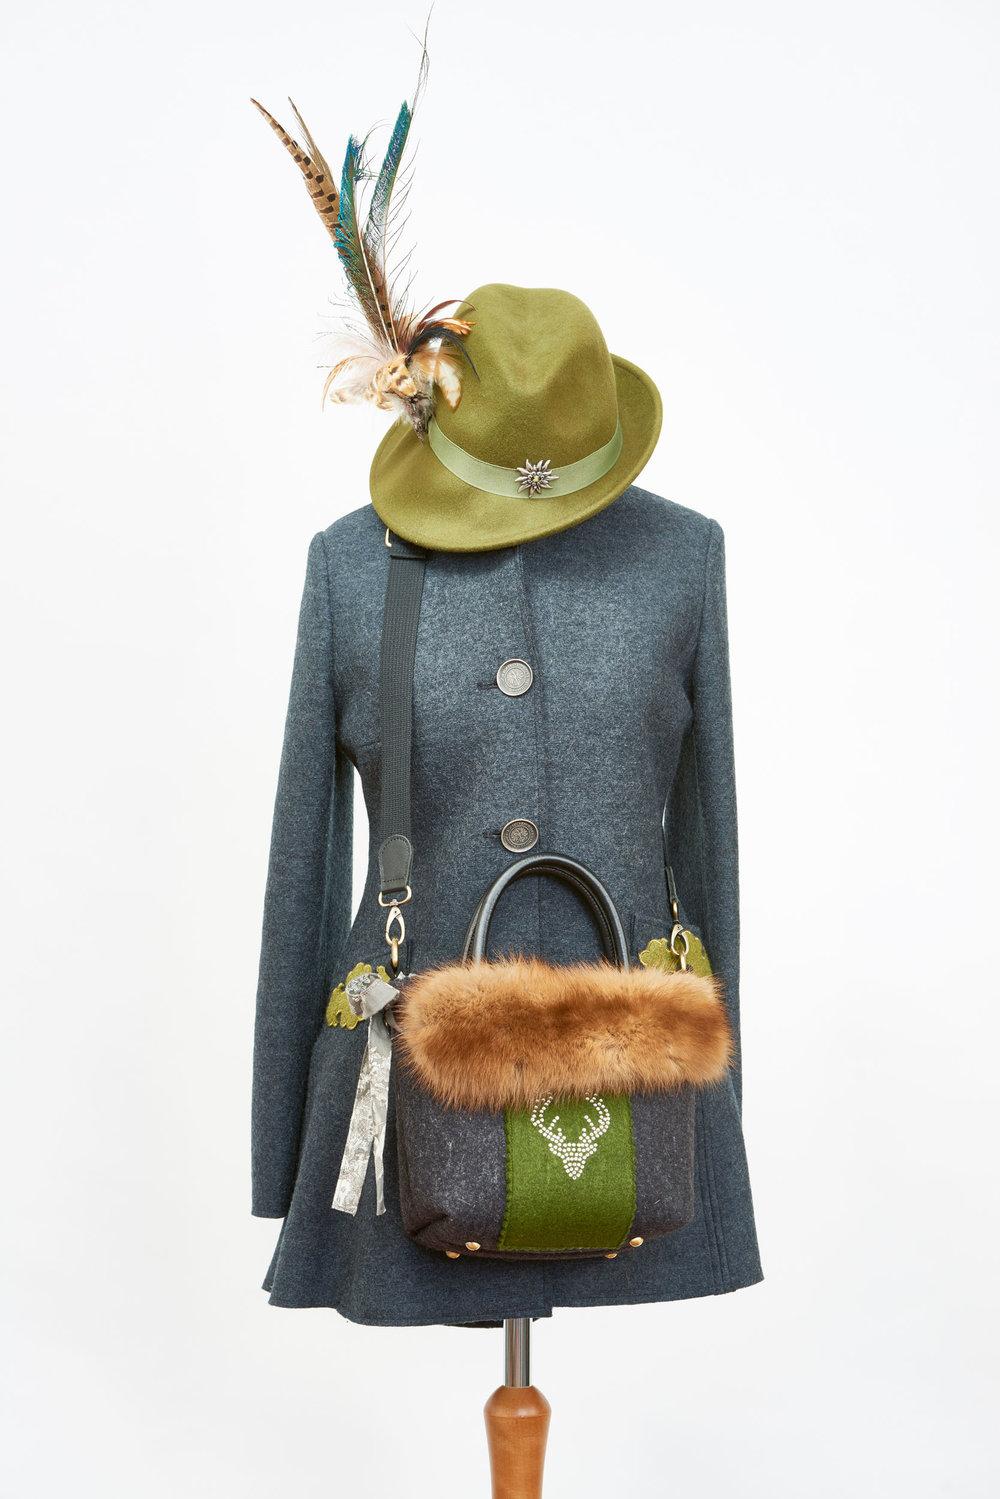 Modedesignerin Huth